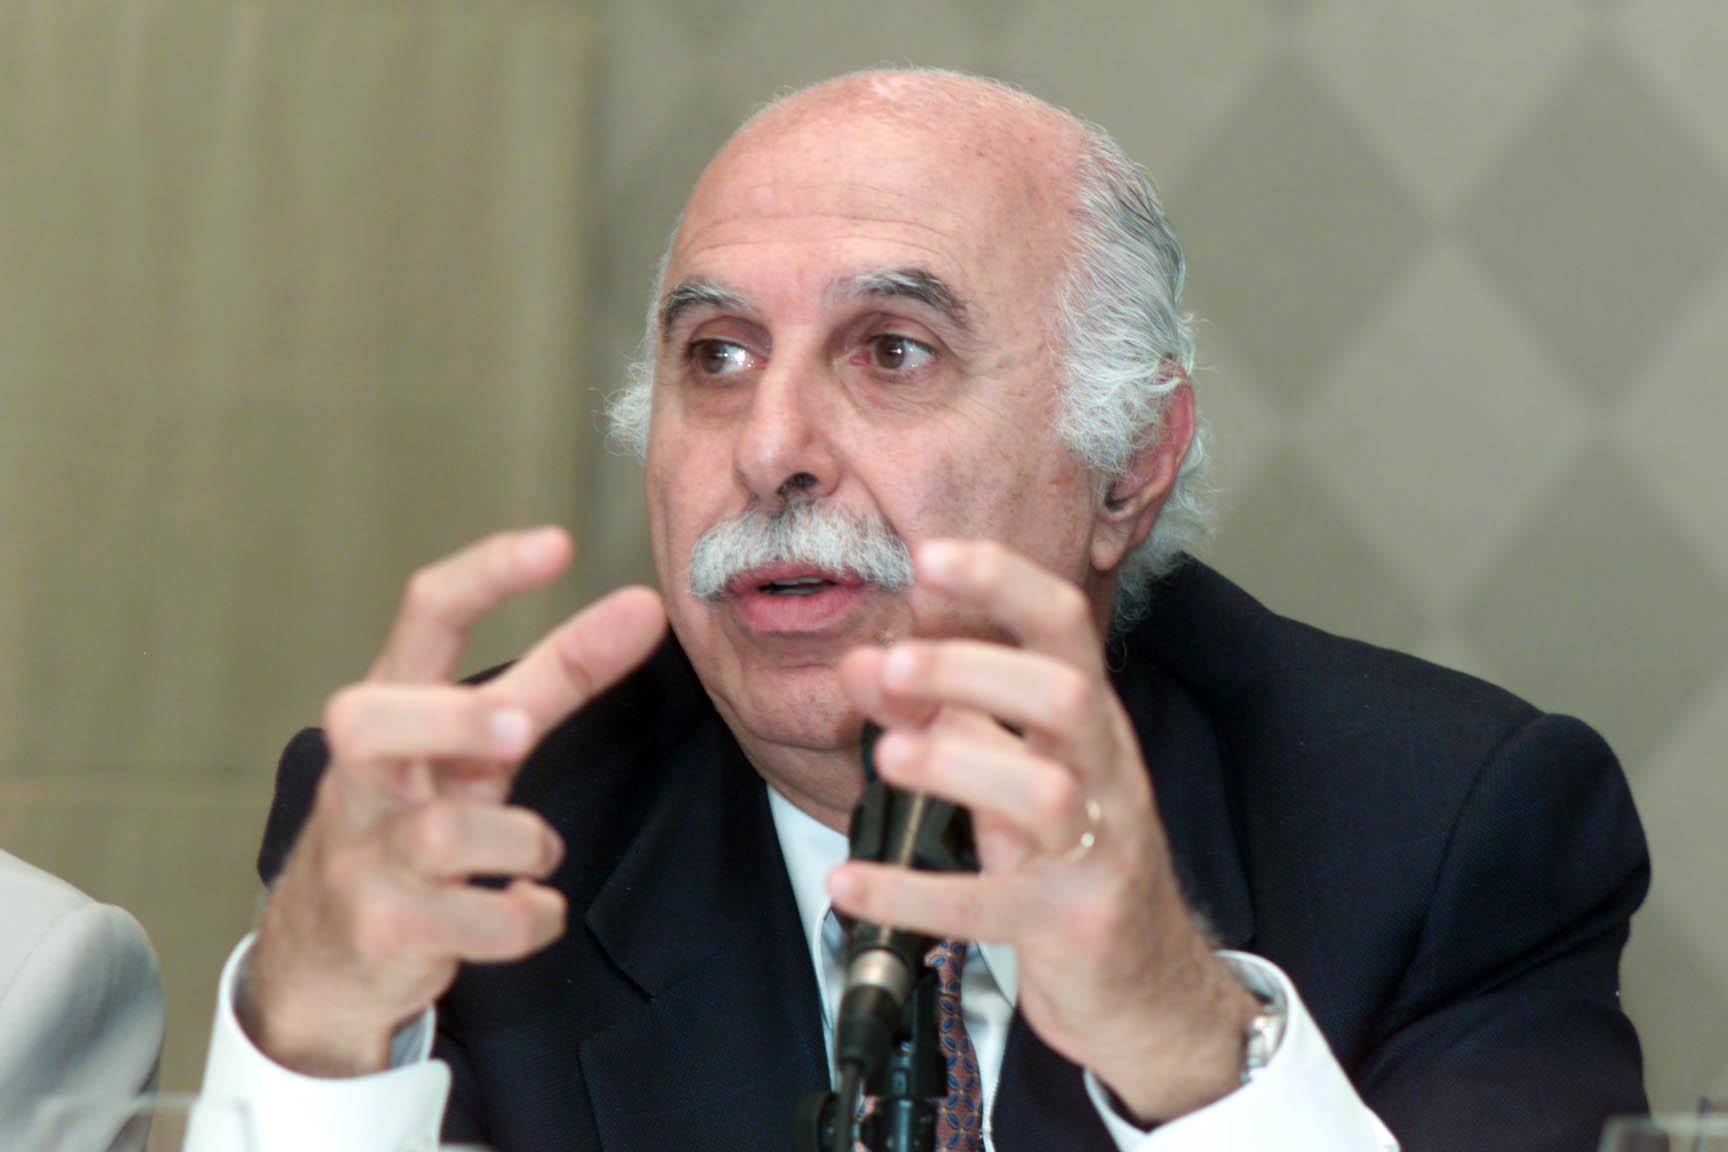 Abdelmassih